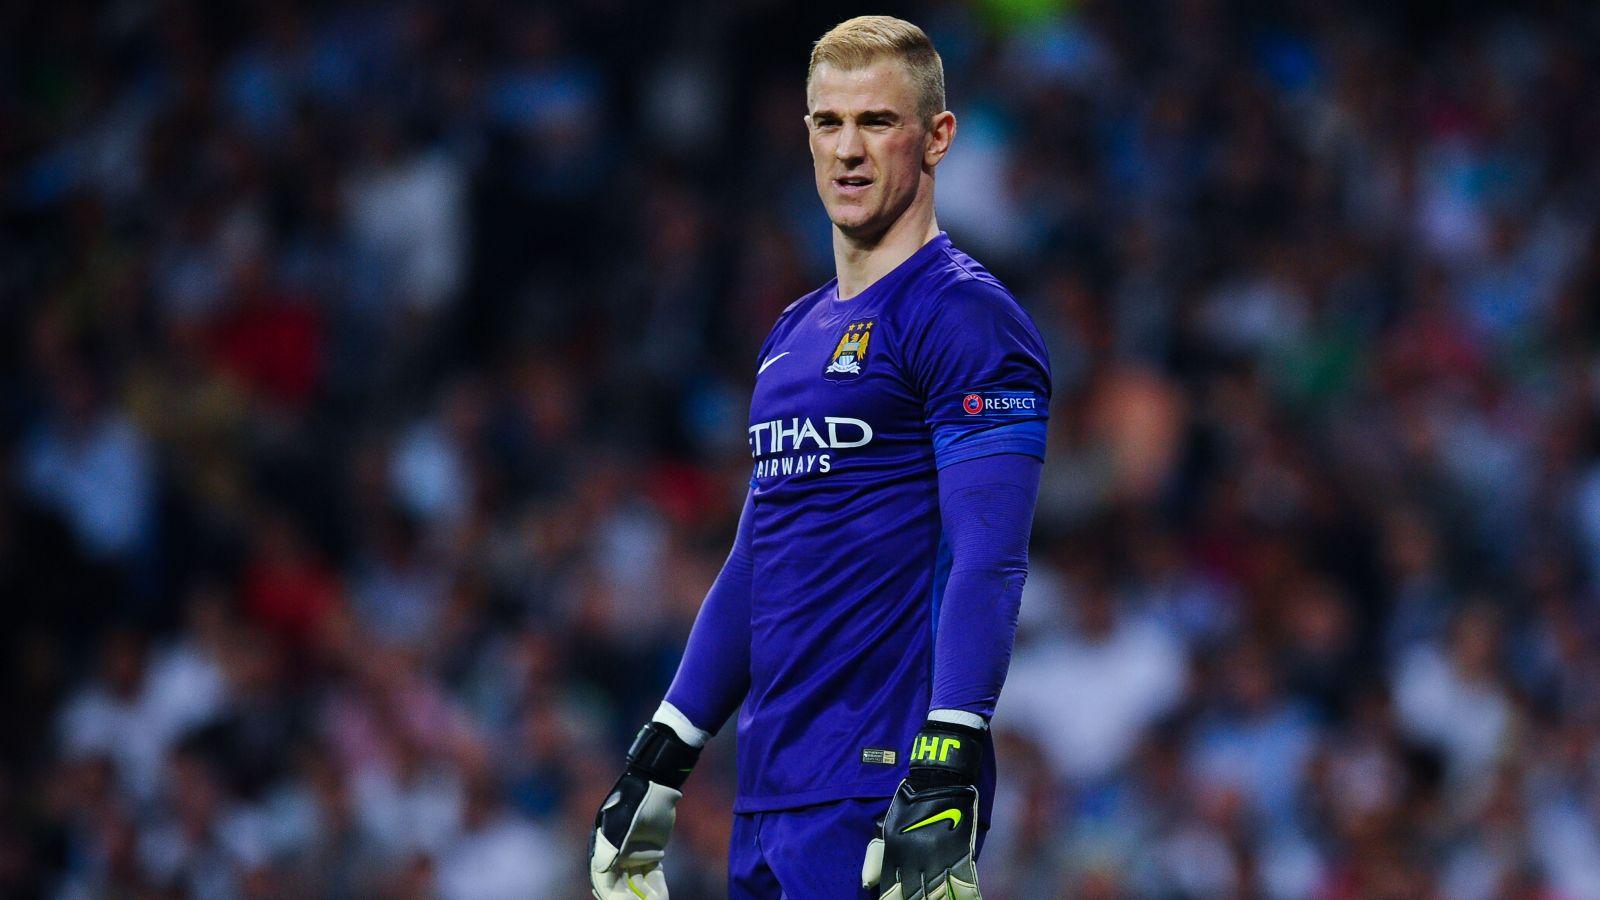 Everton line up sensational bid for Man City keeper Hart